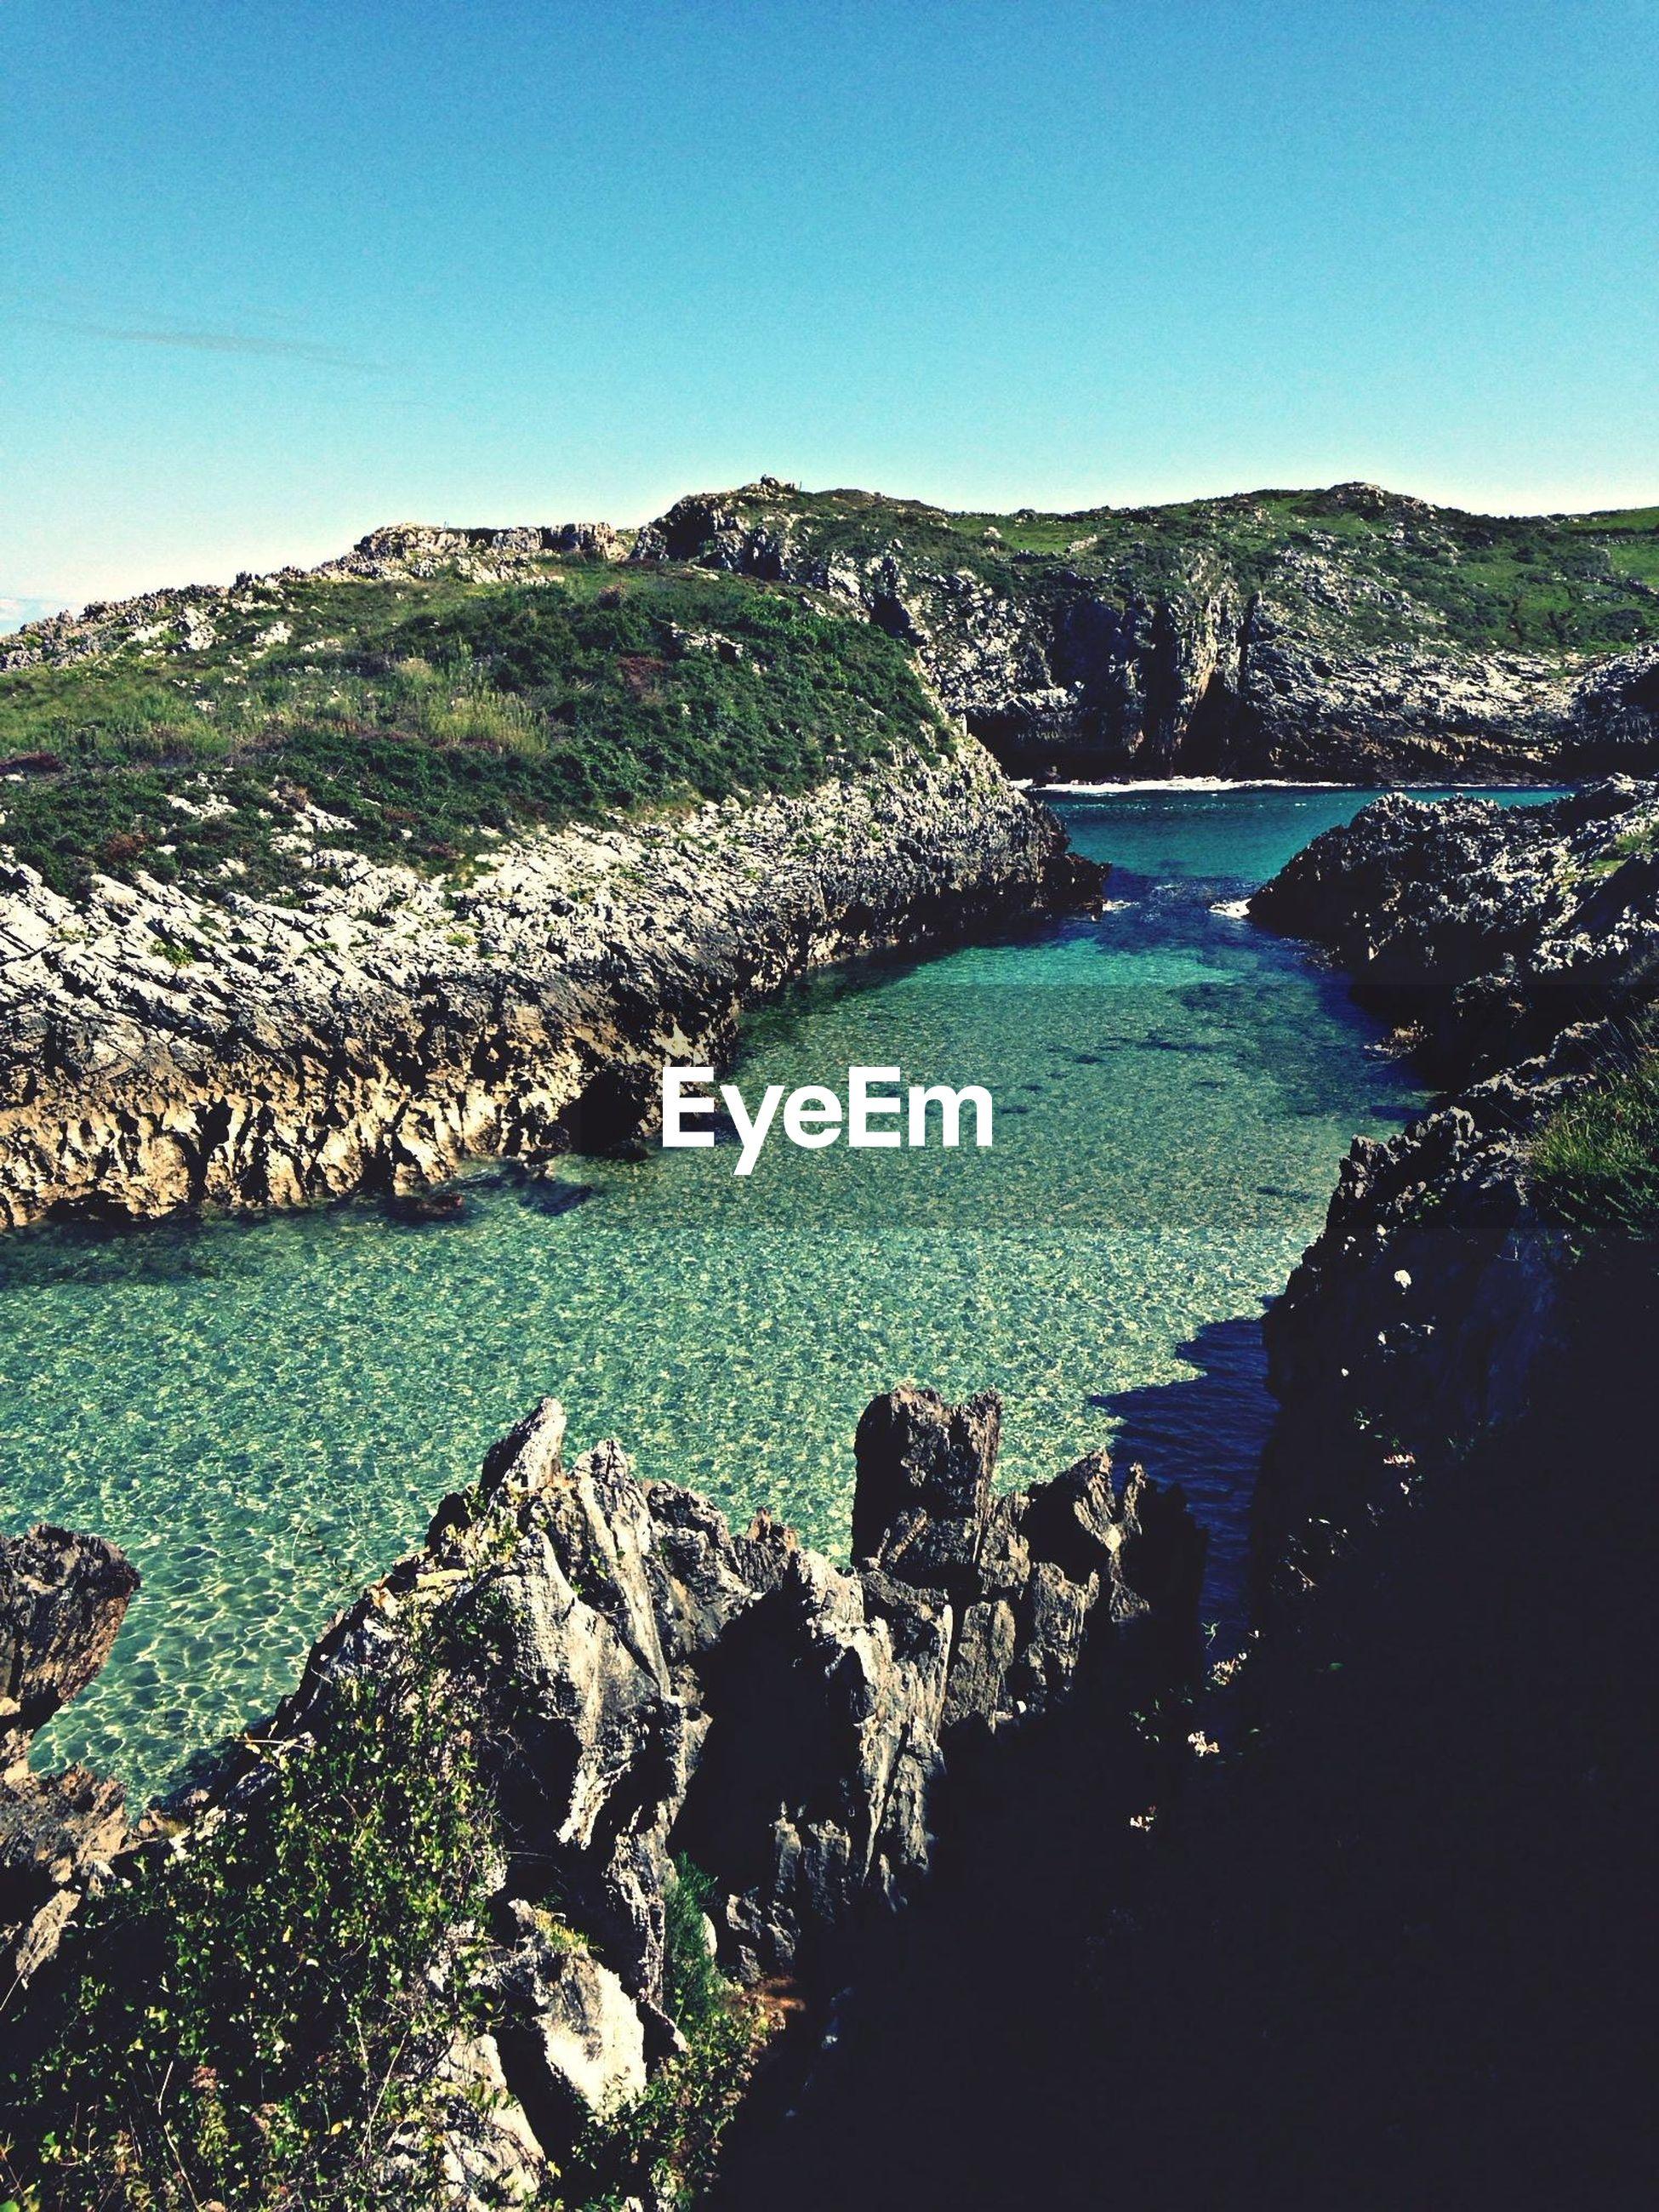 water, tranquil scene, tranquility, scenics, beauty in nature, clear sky, mountain, nature, blue, landscape, sea, idyllic, non-urban scene, rock - object, sky, sunlight, coastline, beach, remote, day